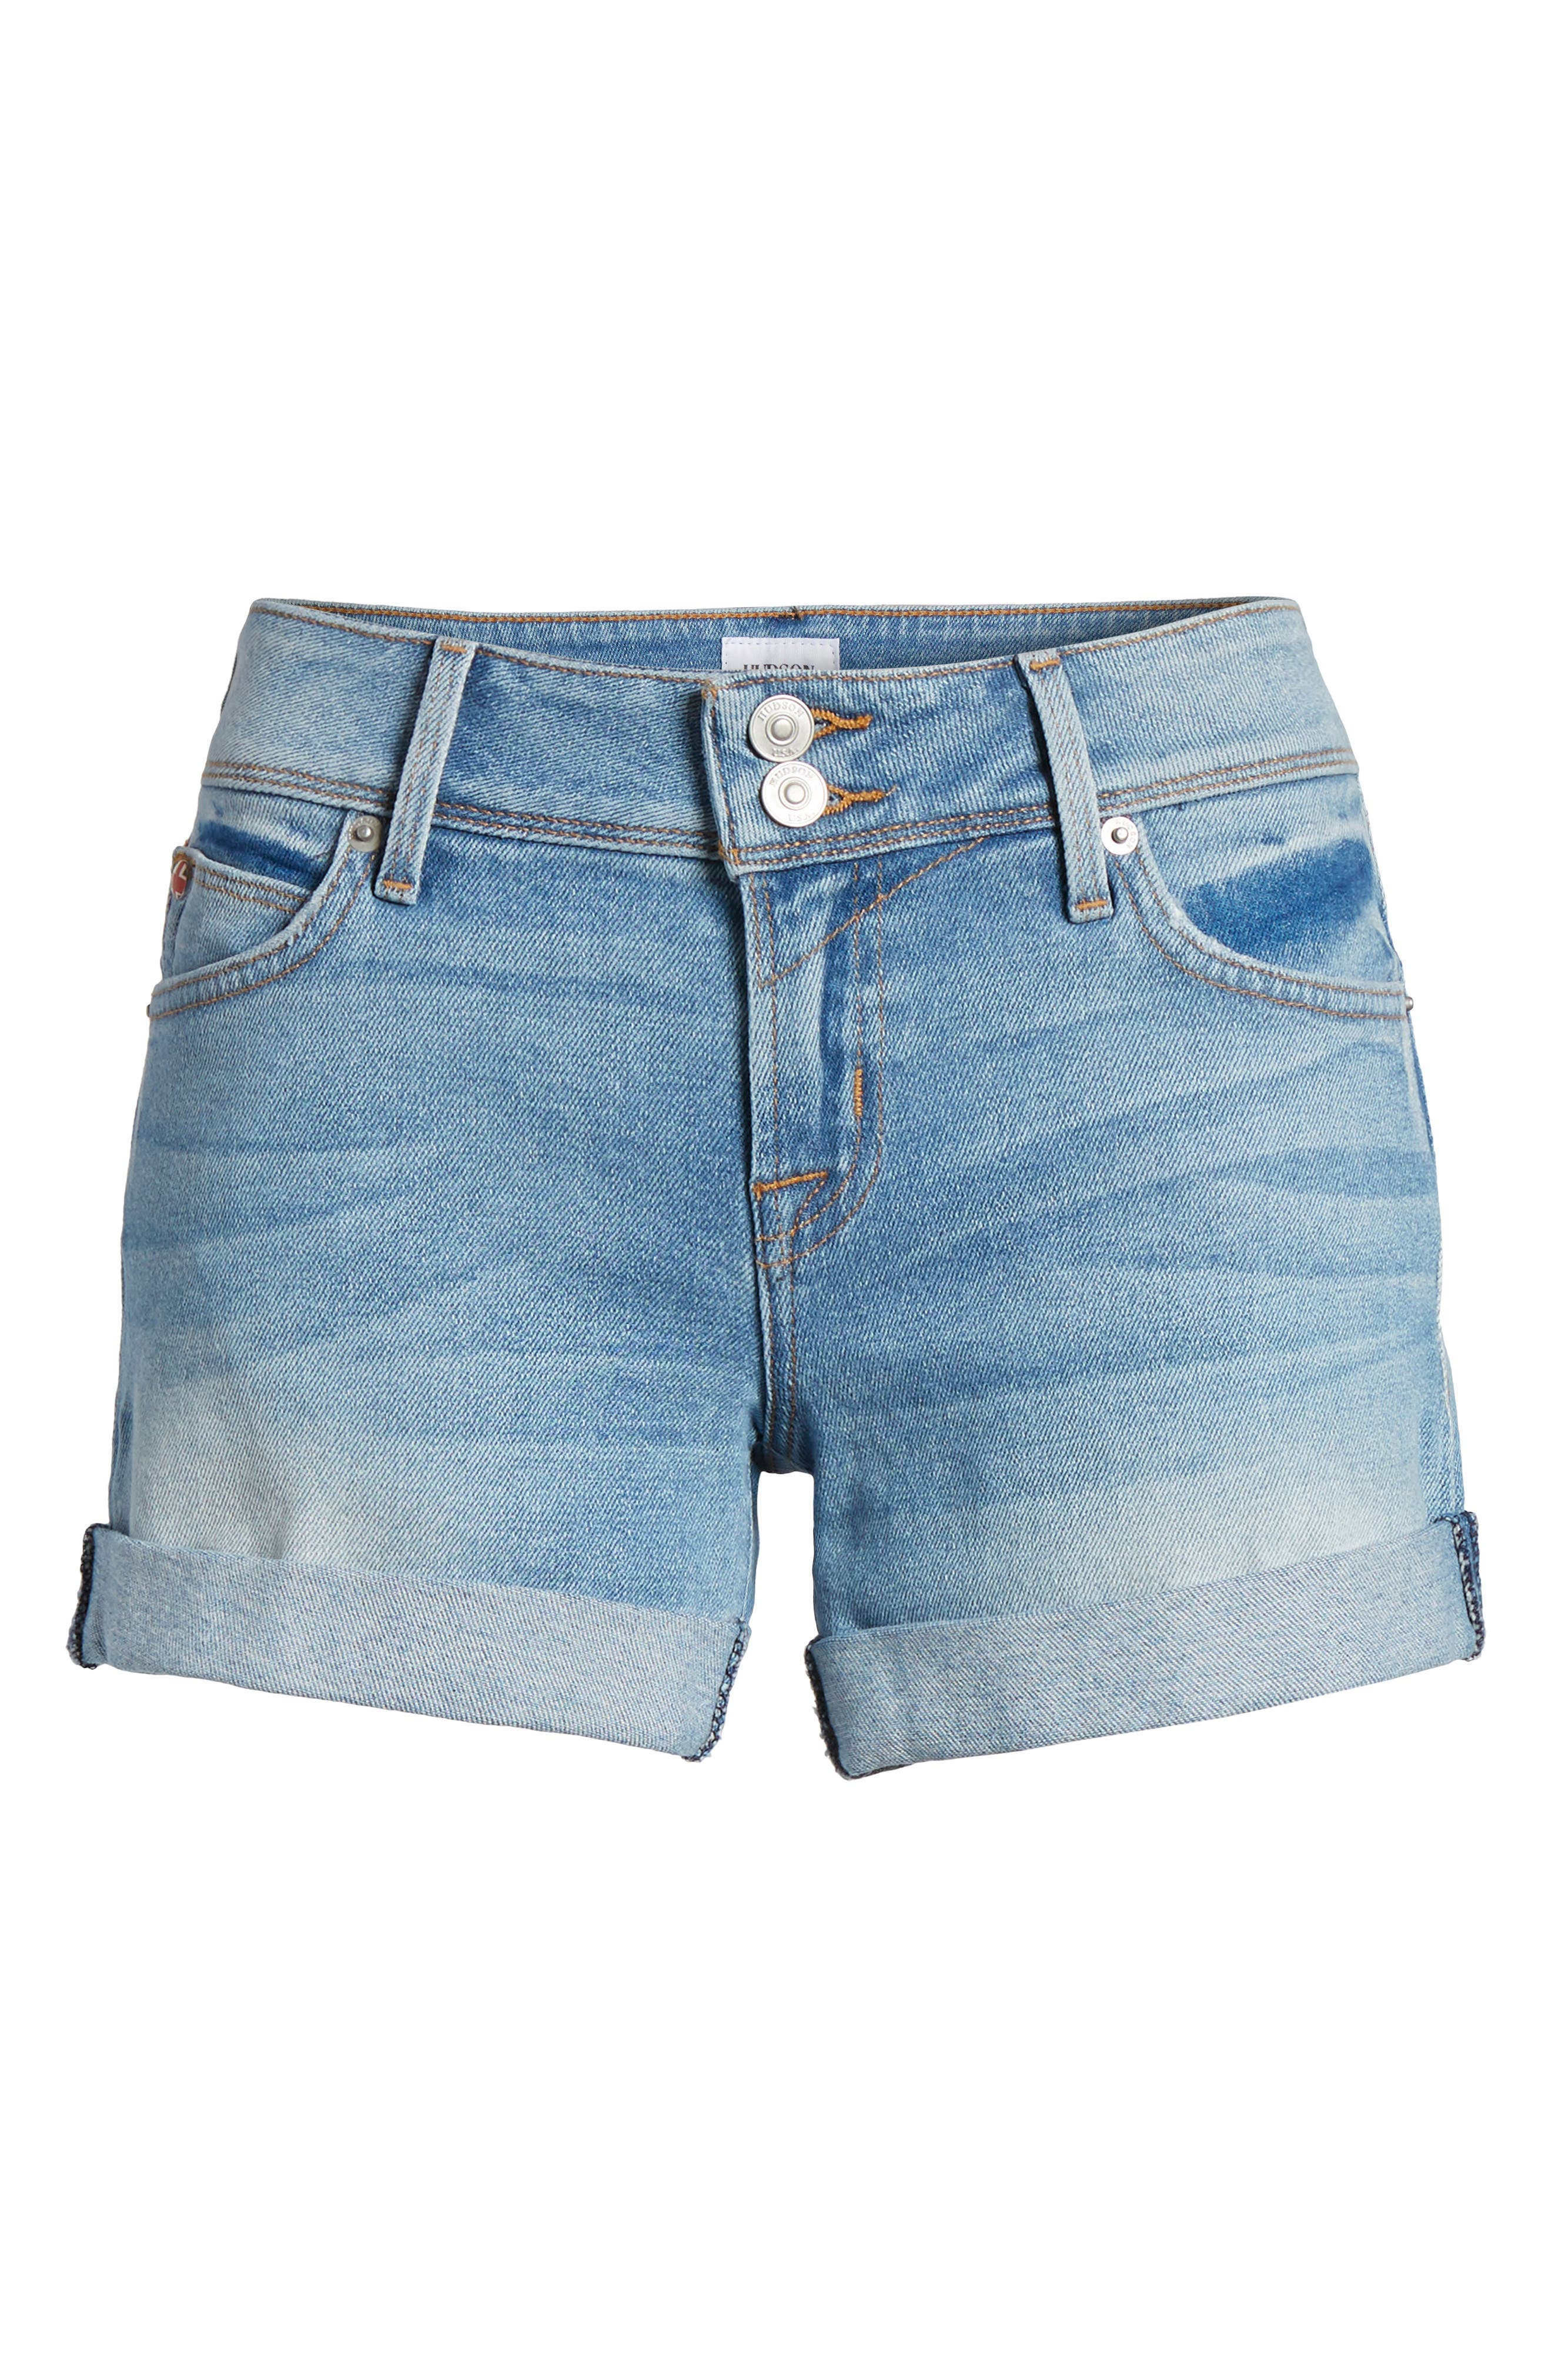 Croxley Cuff Denim Shorts,                             Alternate thumbnail 6, color,                             ROLLING HILLS